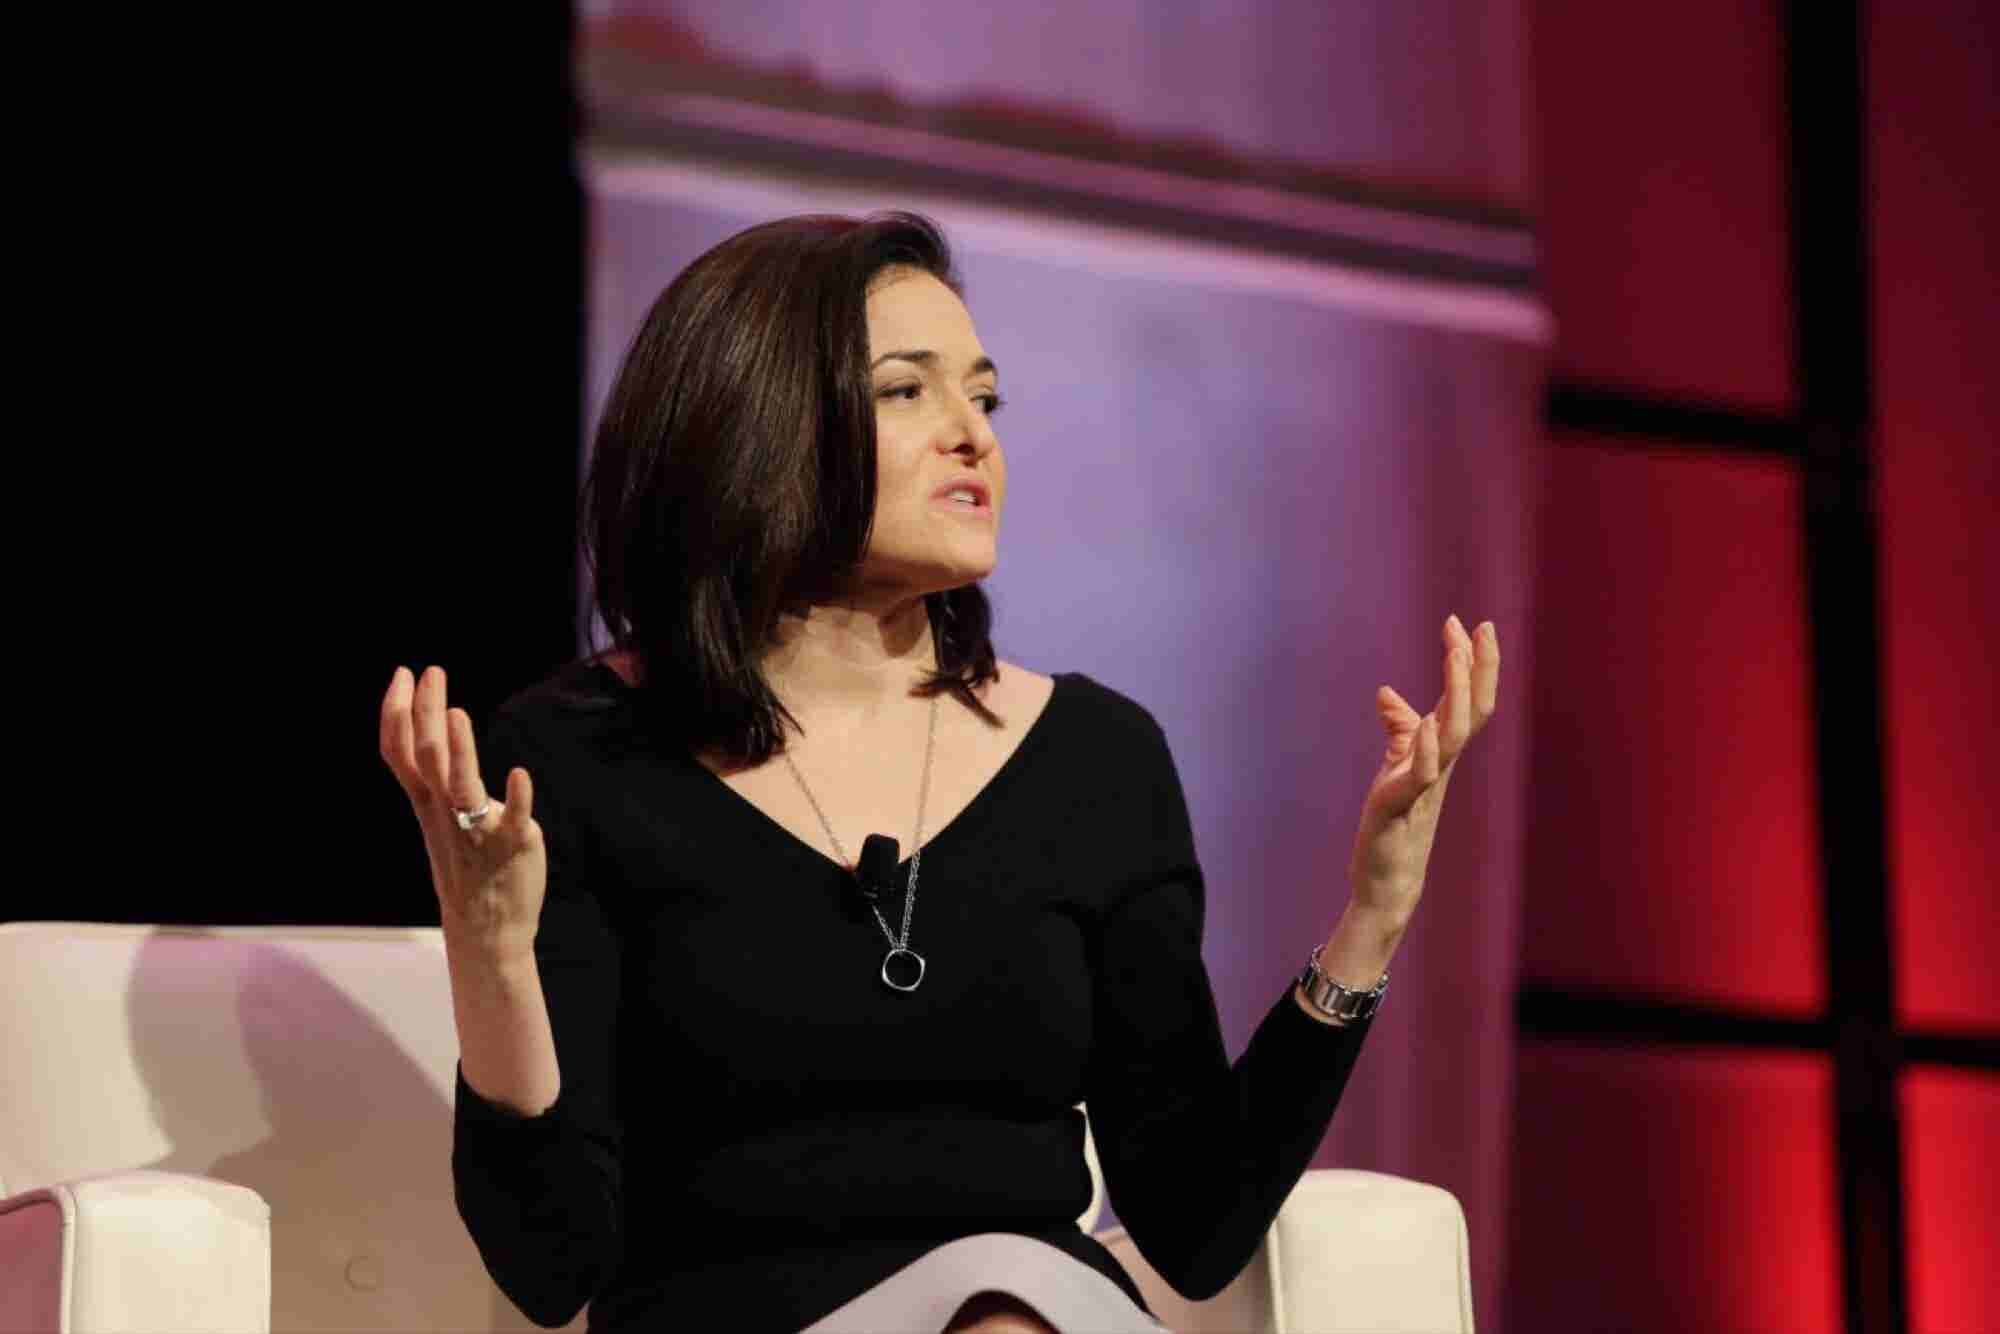 Sheryl Sandberg's 6 Steps to Make Sure Everyone Feels Safe at Work